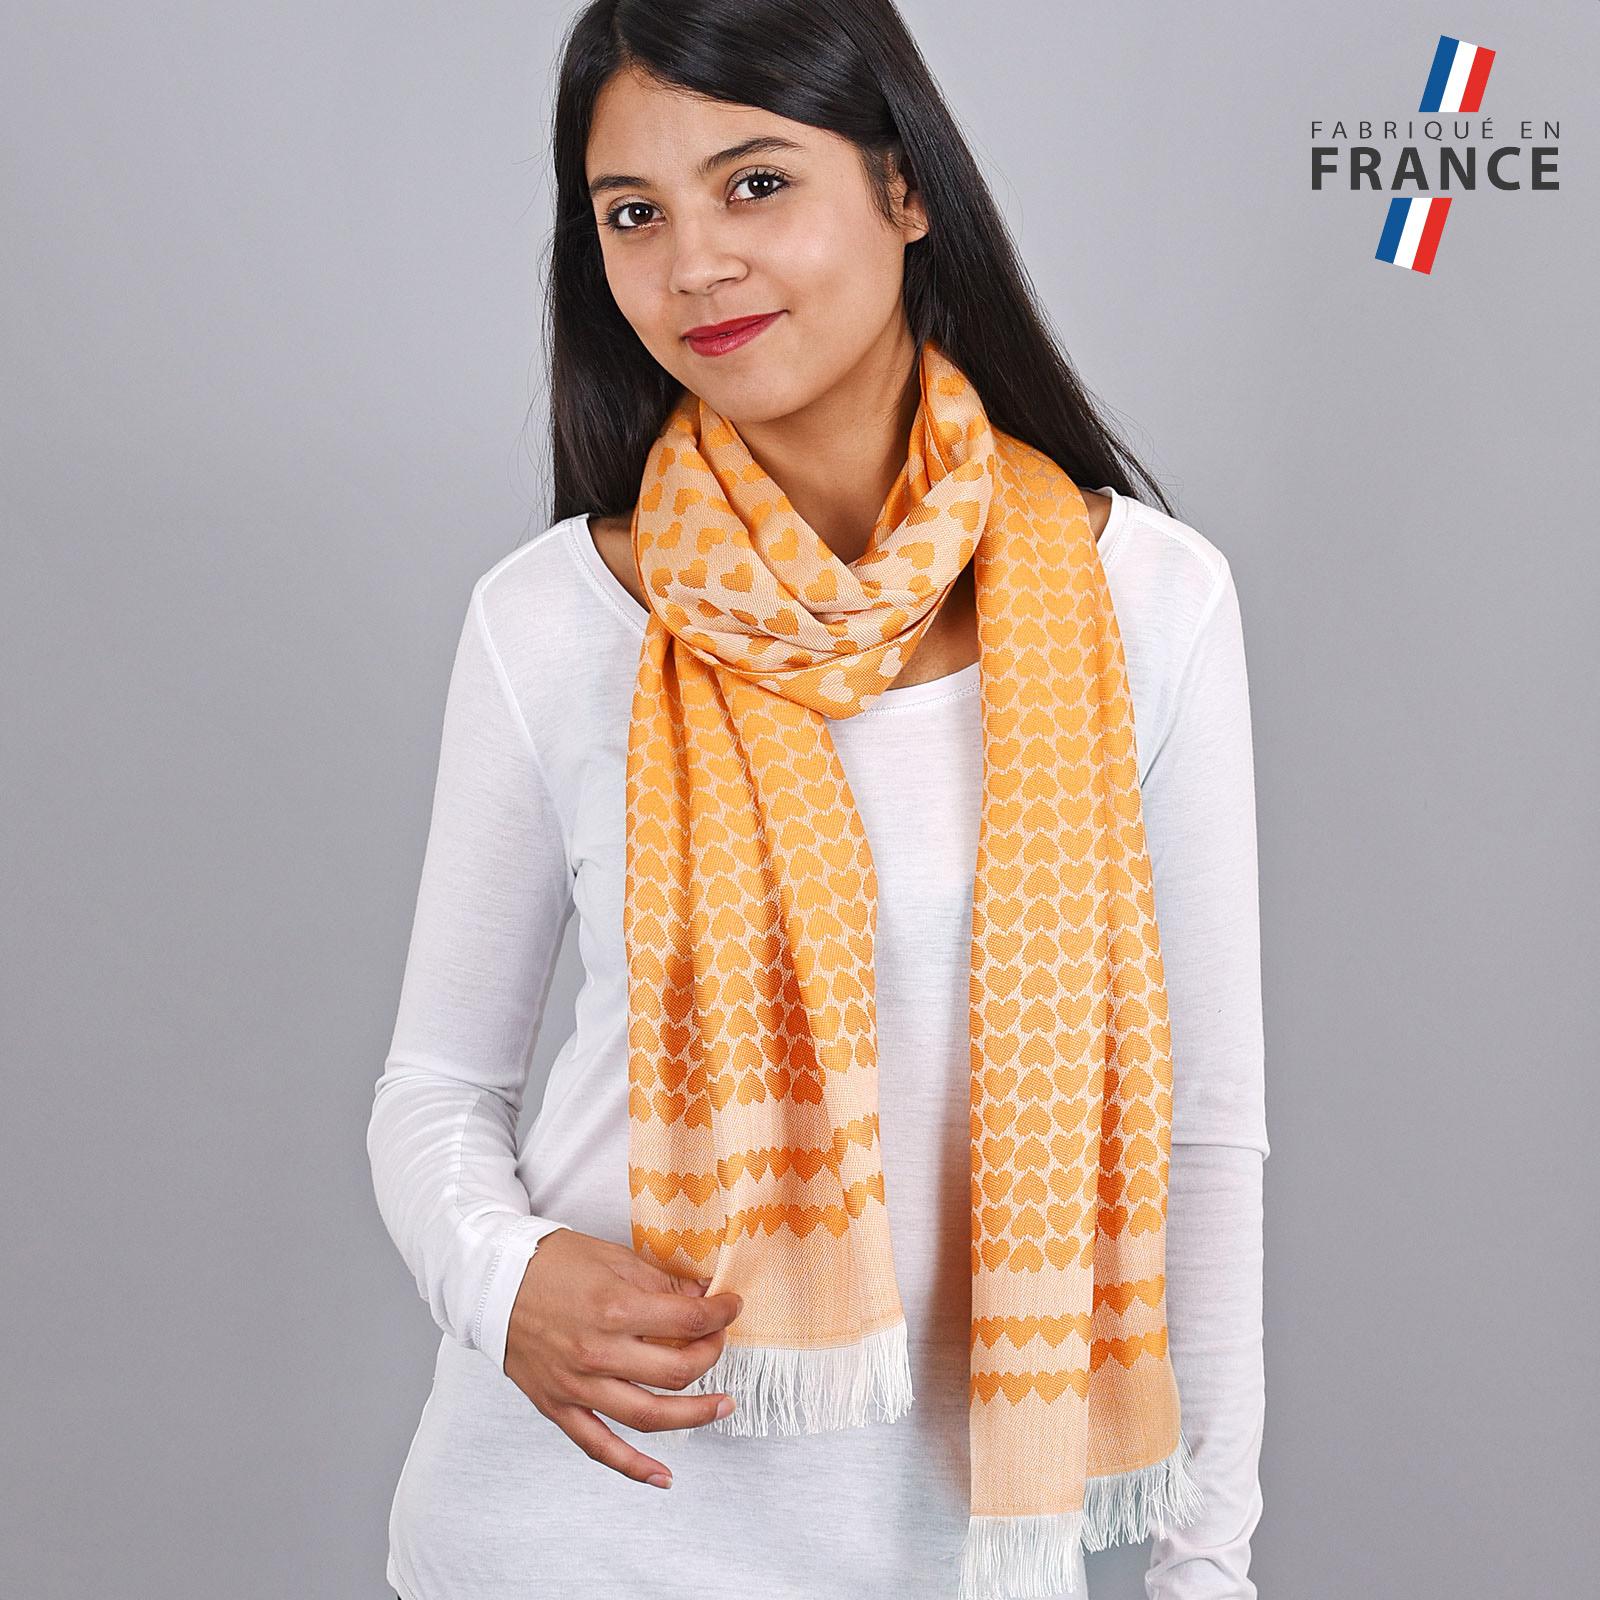 AT-04273-VF16-LB_FR-echarpe-orange-motifs-coeurs